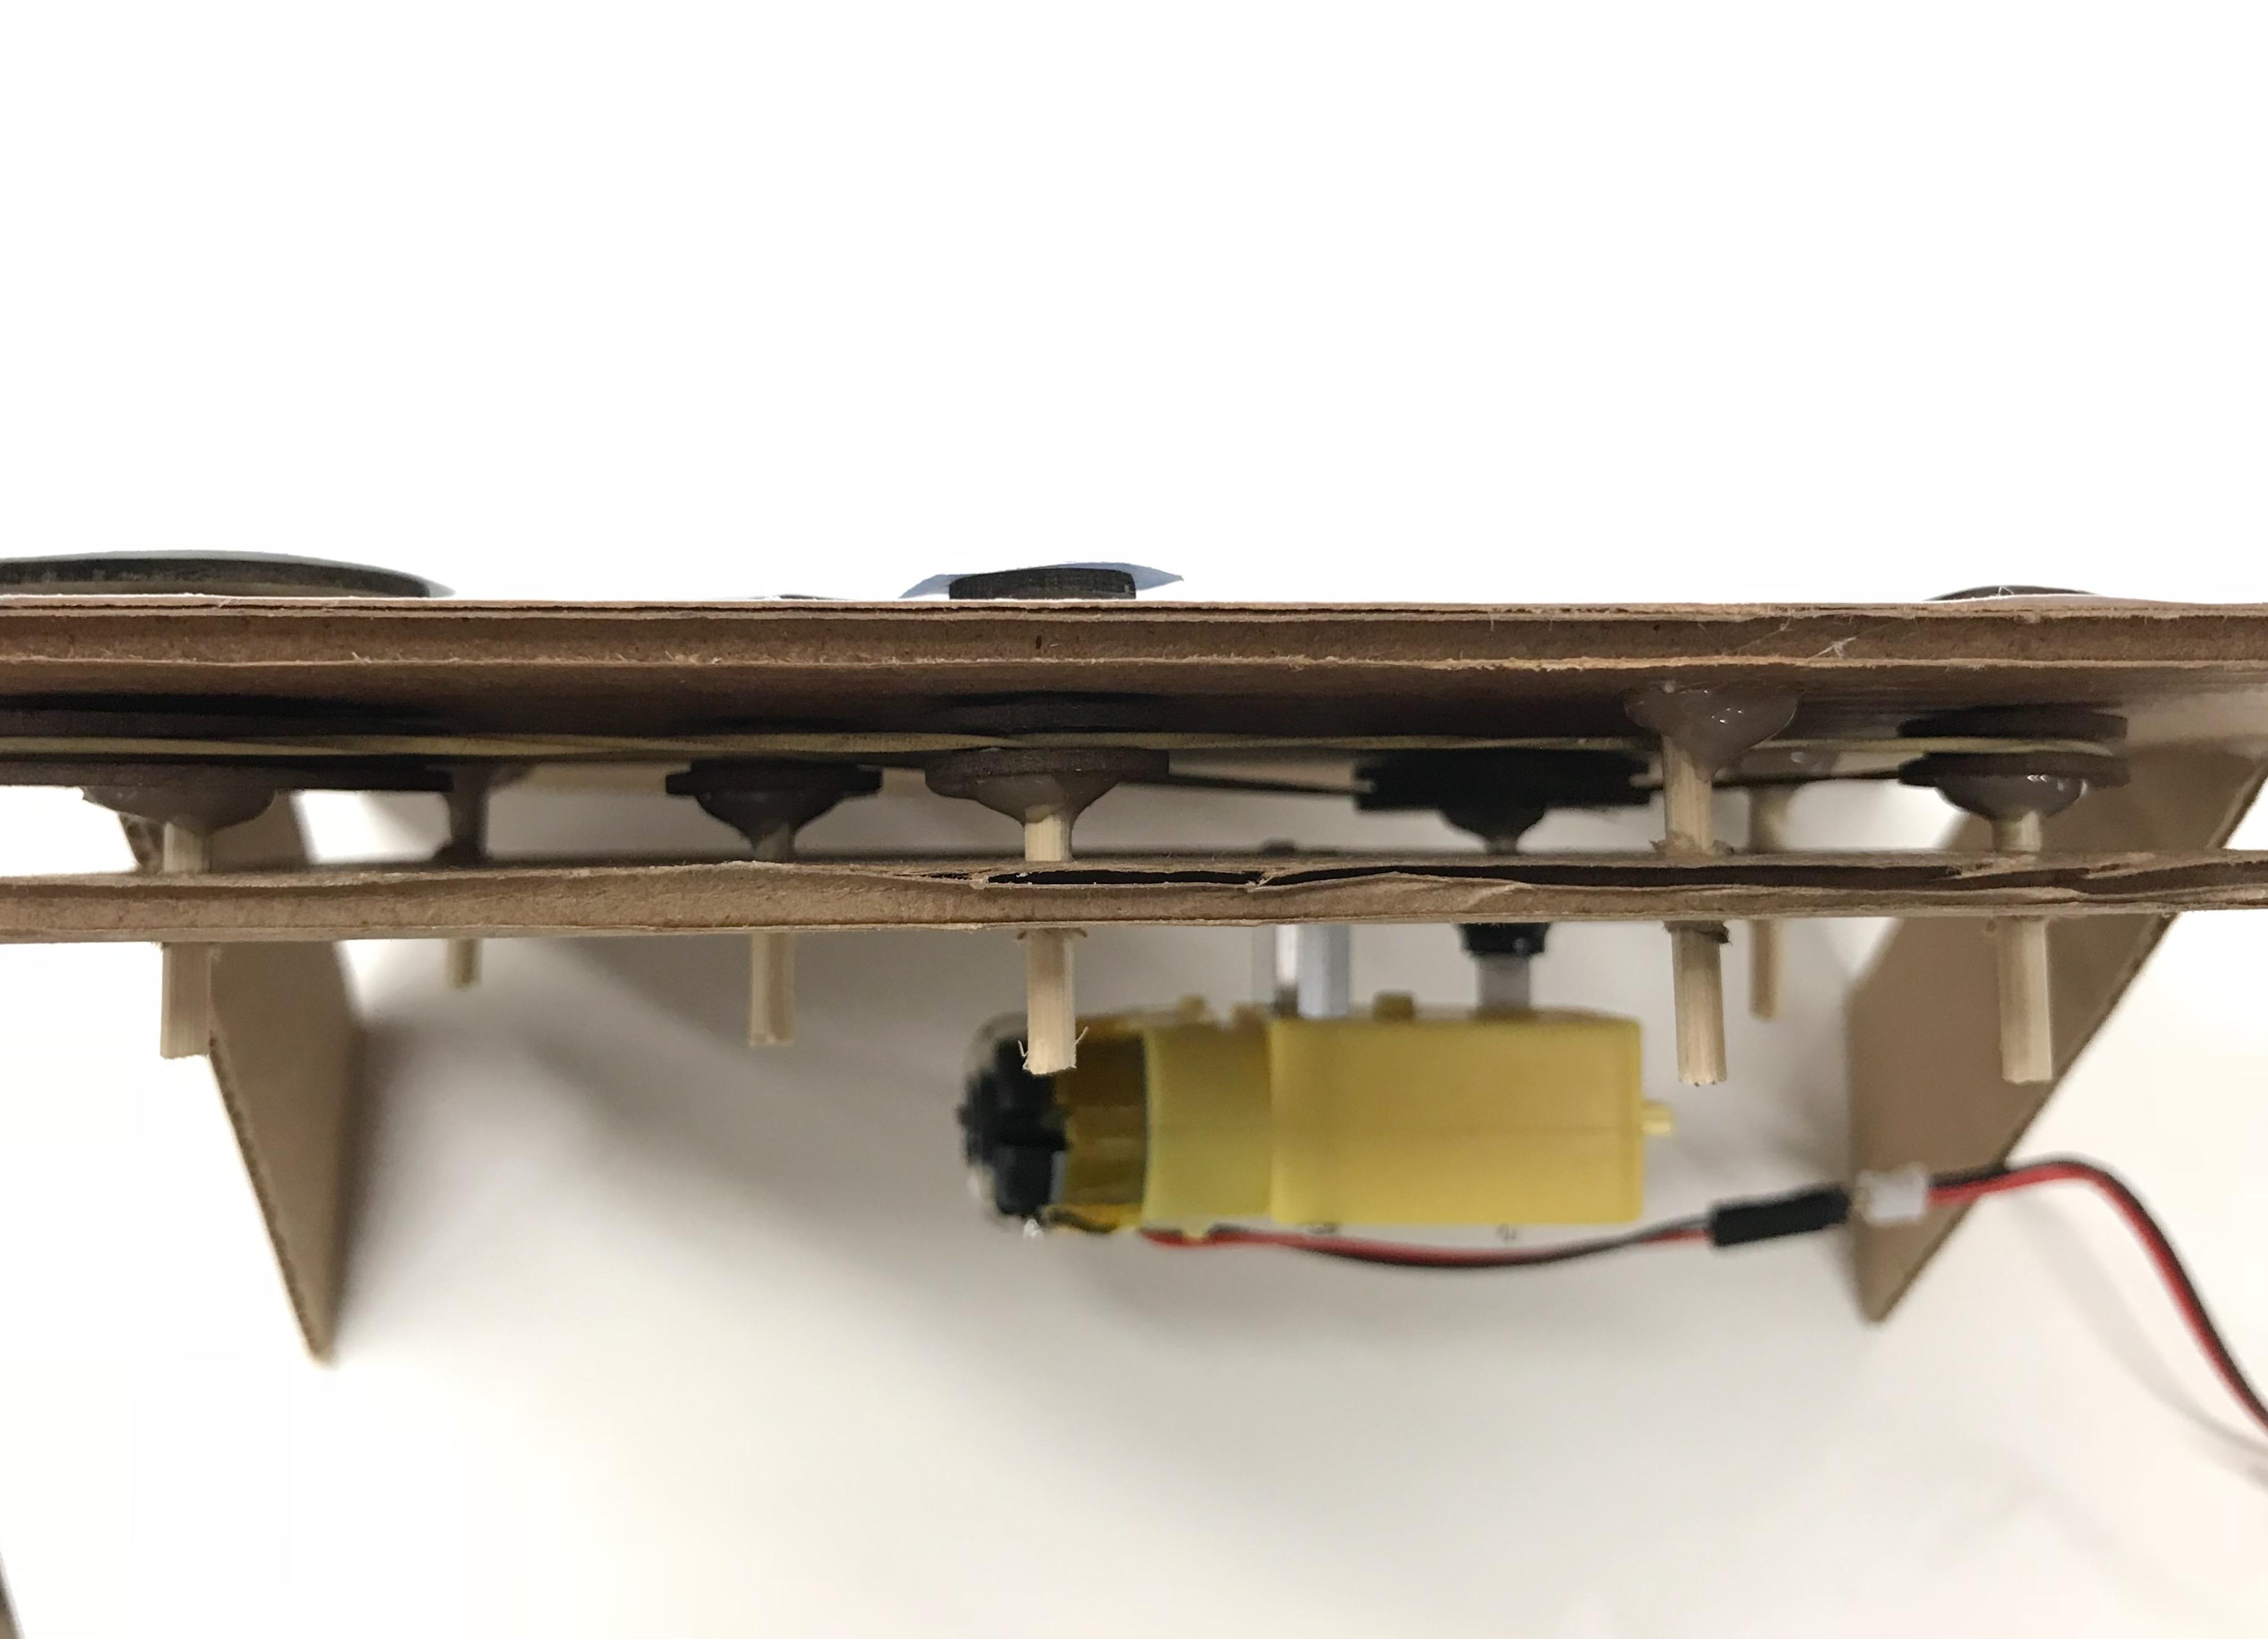 circuitpython_A4B60D0A-6FD7-415F-A1B1-10AFC4EFFDCF.jpg